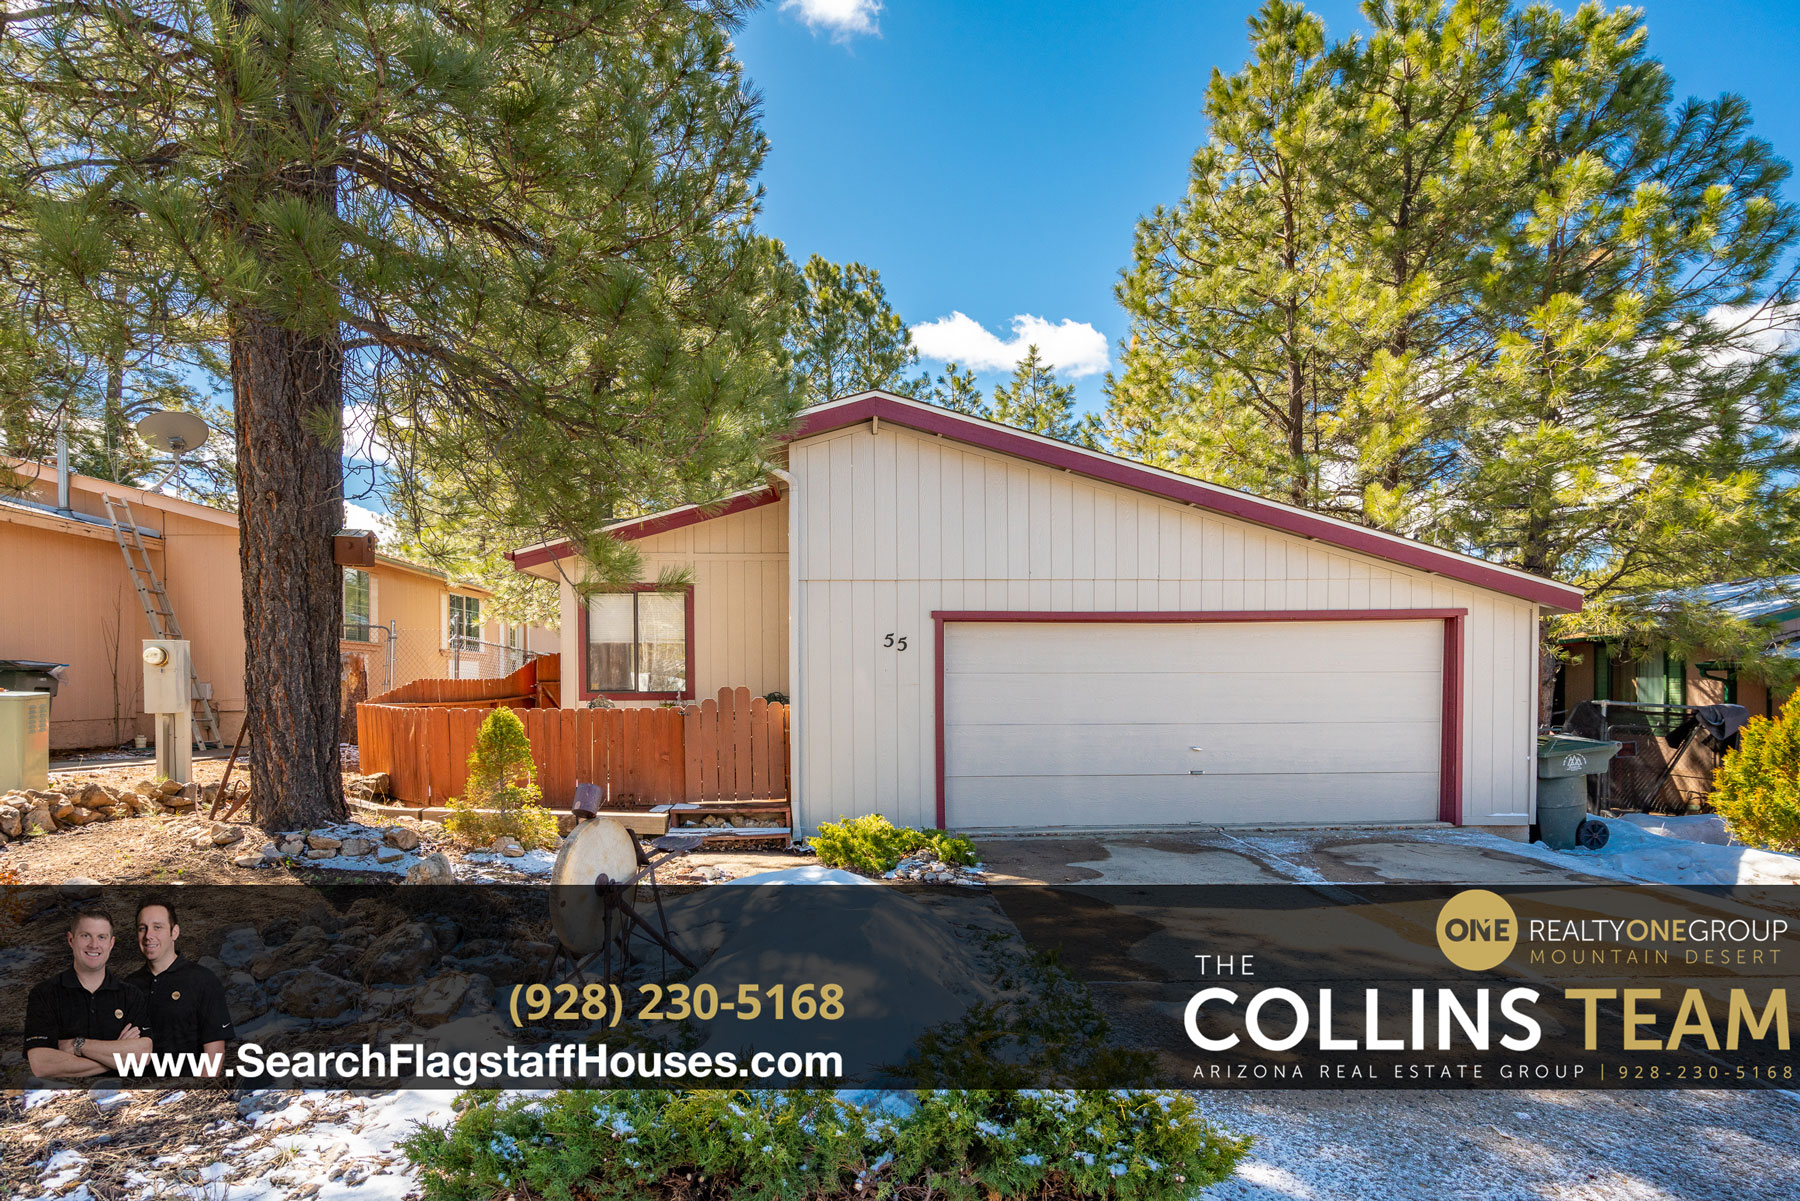 Lake Mary Estates Home in Flagstaff - 55 E Camille Dr, Flagstaff, AZ 86005